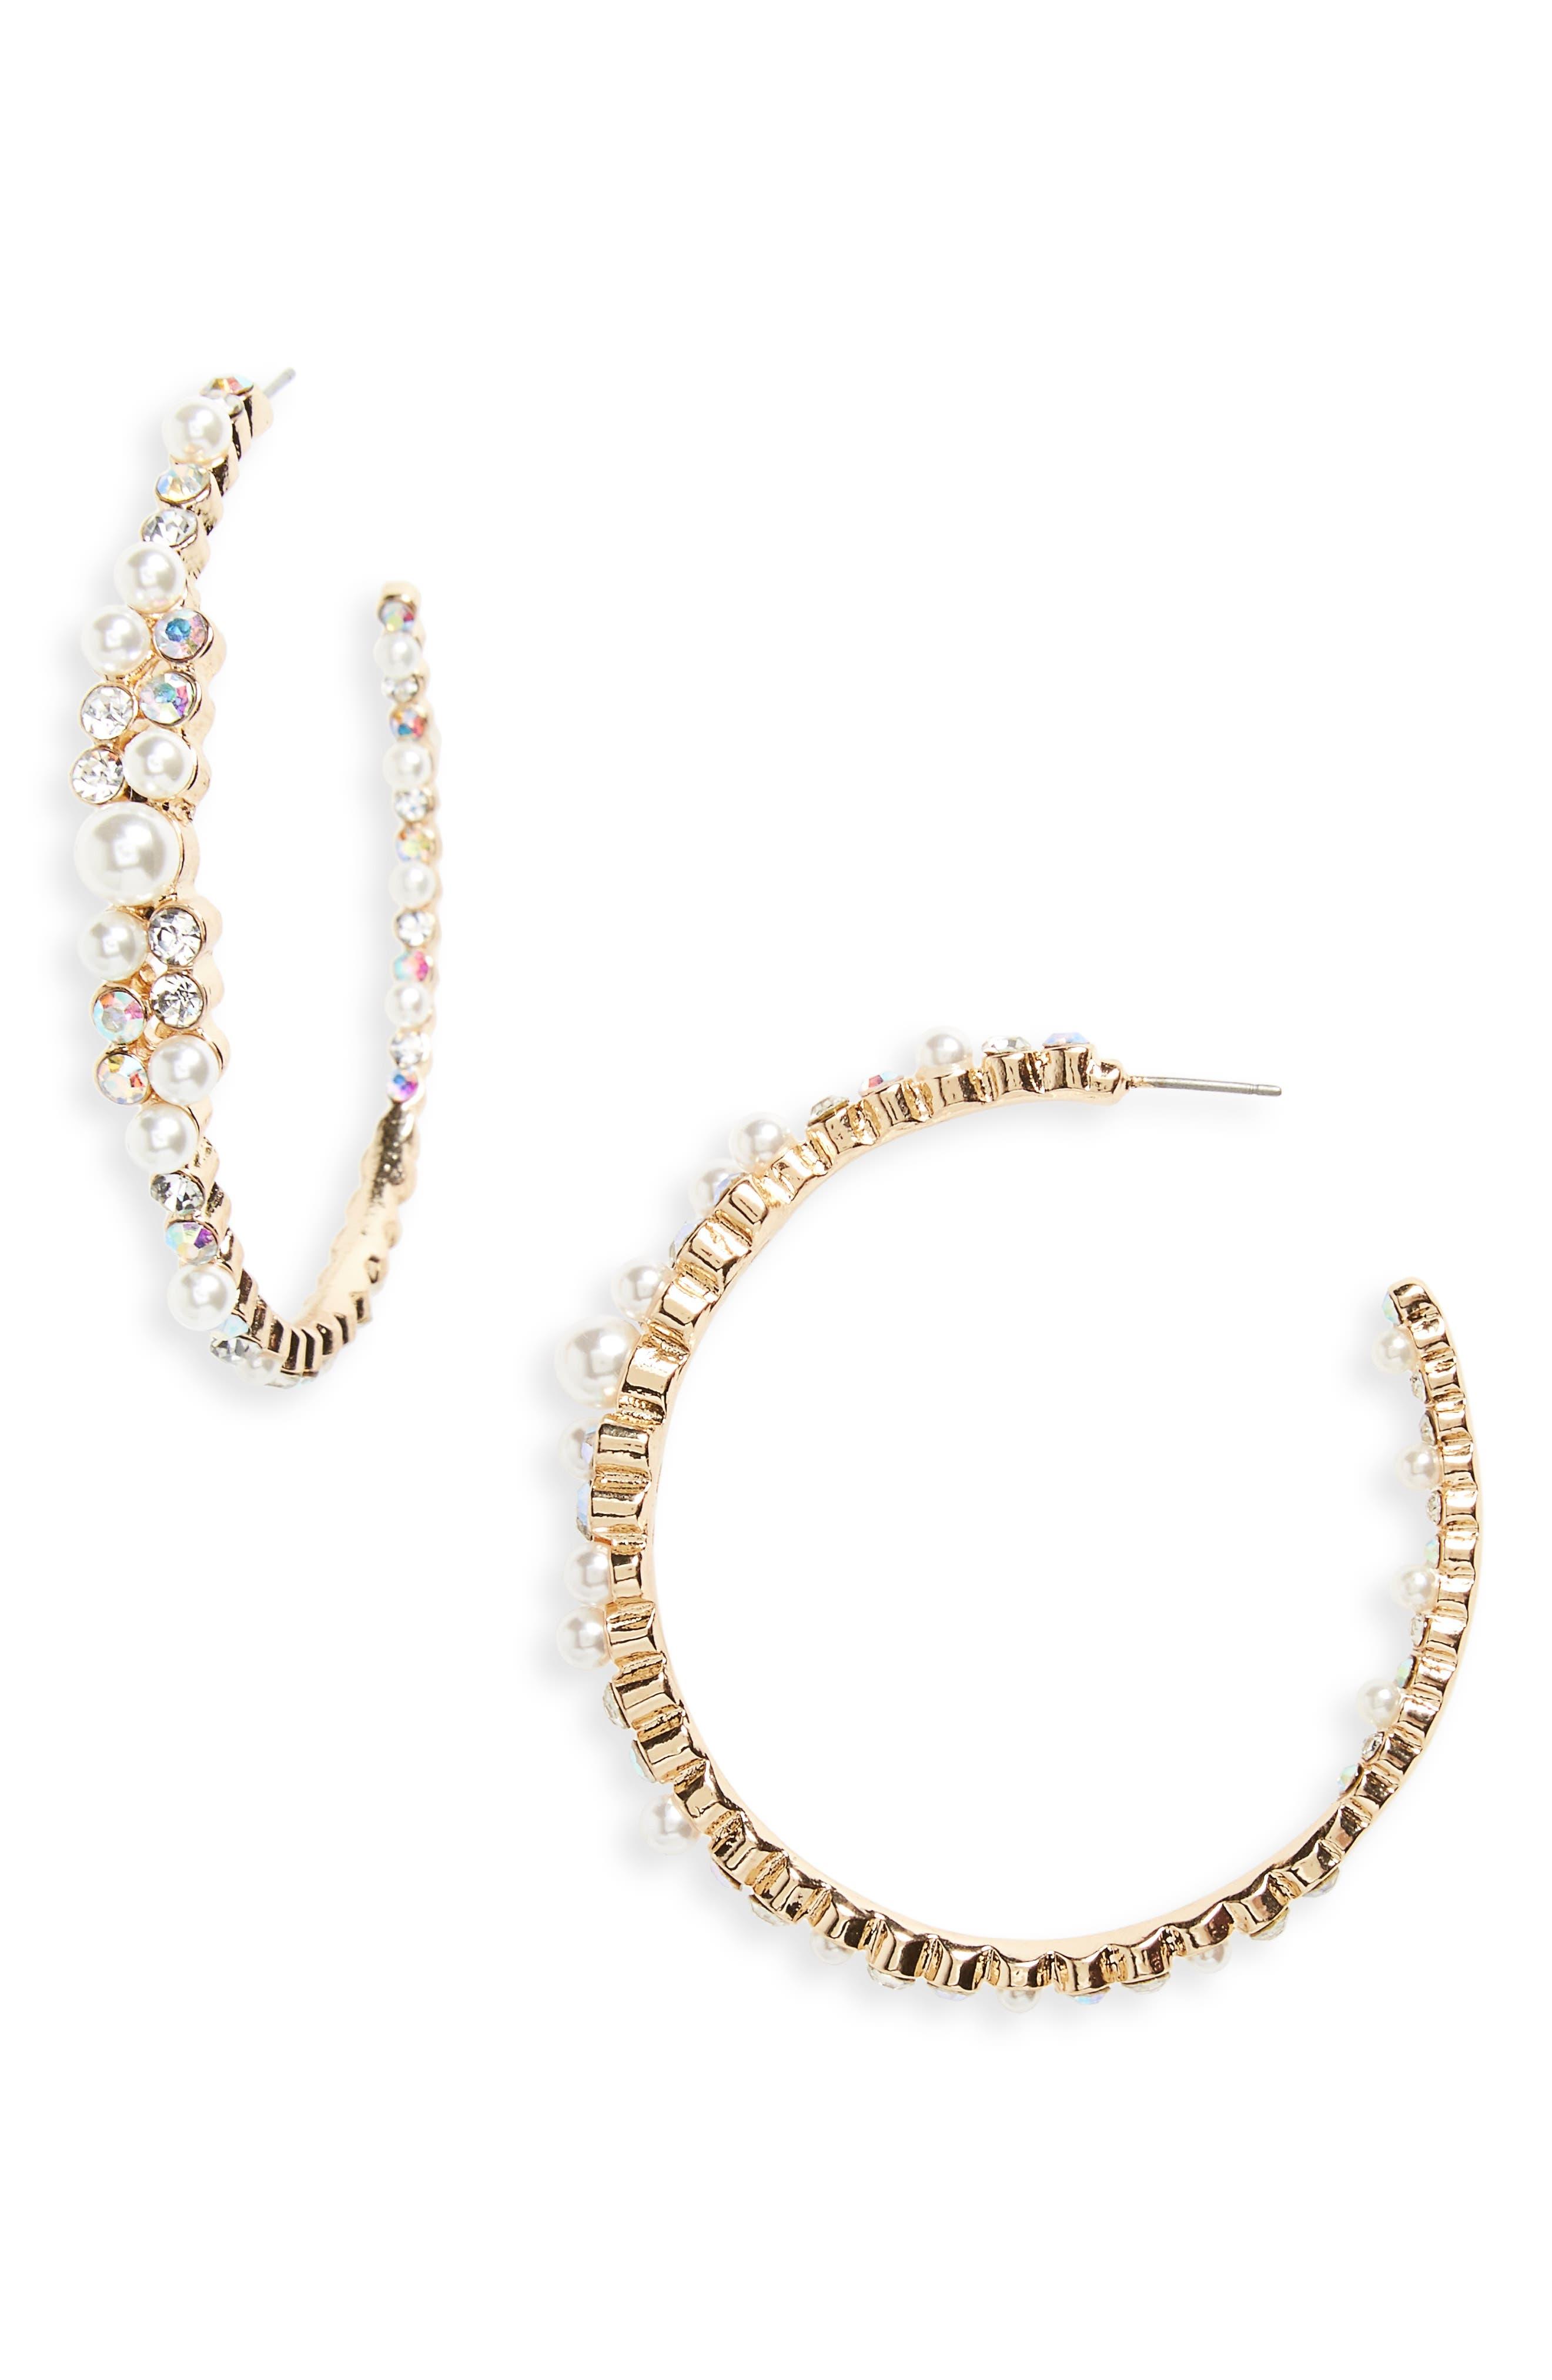 Imitation Pearl & Crystal Hoop Earrings,                             Main thumbnail 1, color,                             Gold/ Pearl/ Crystal